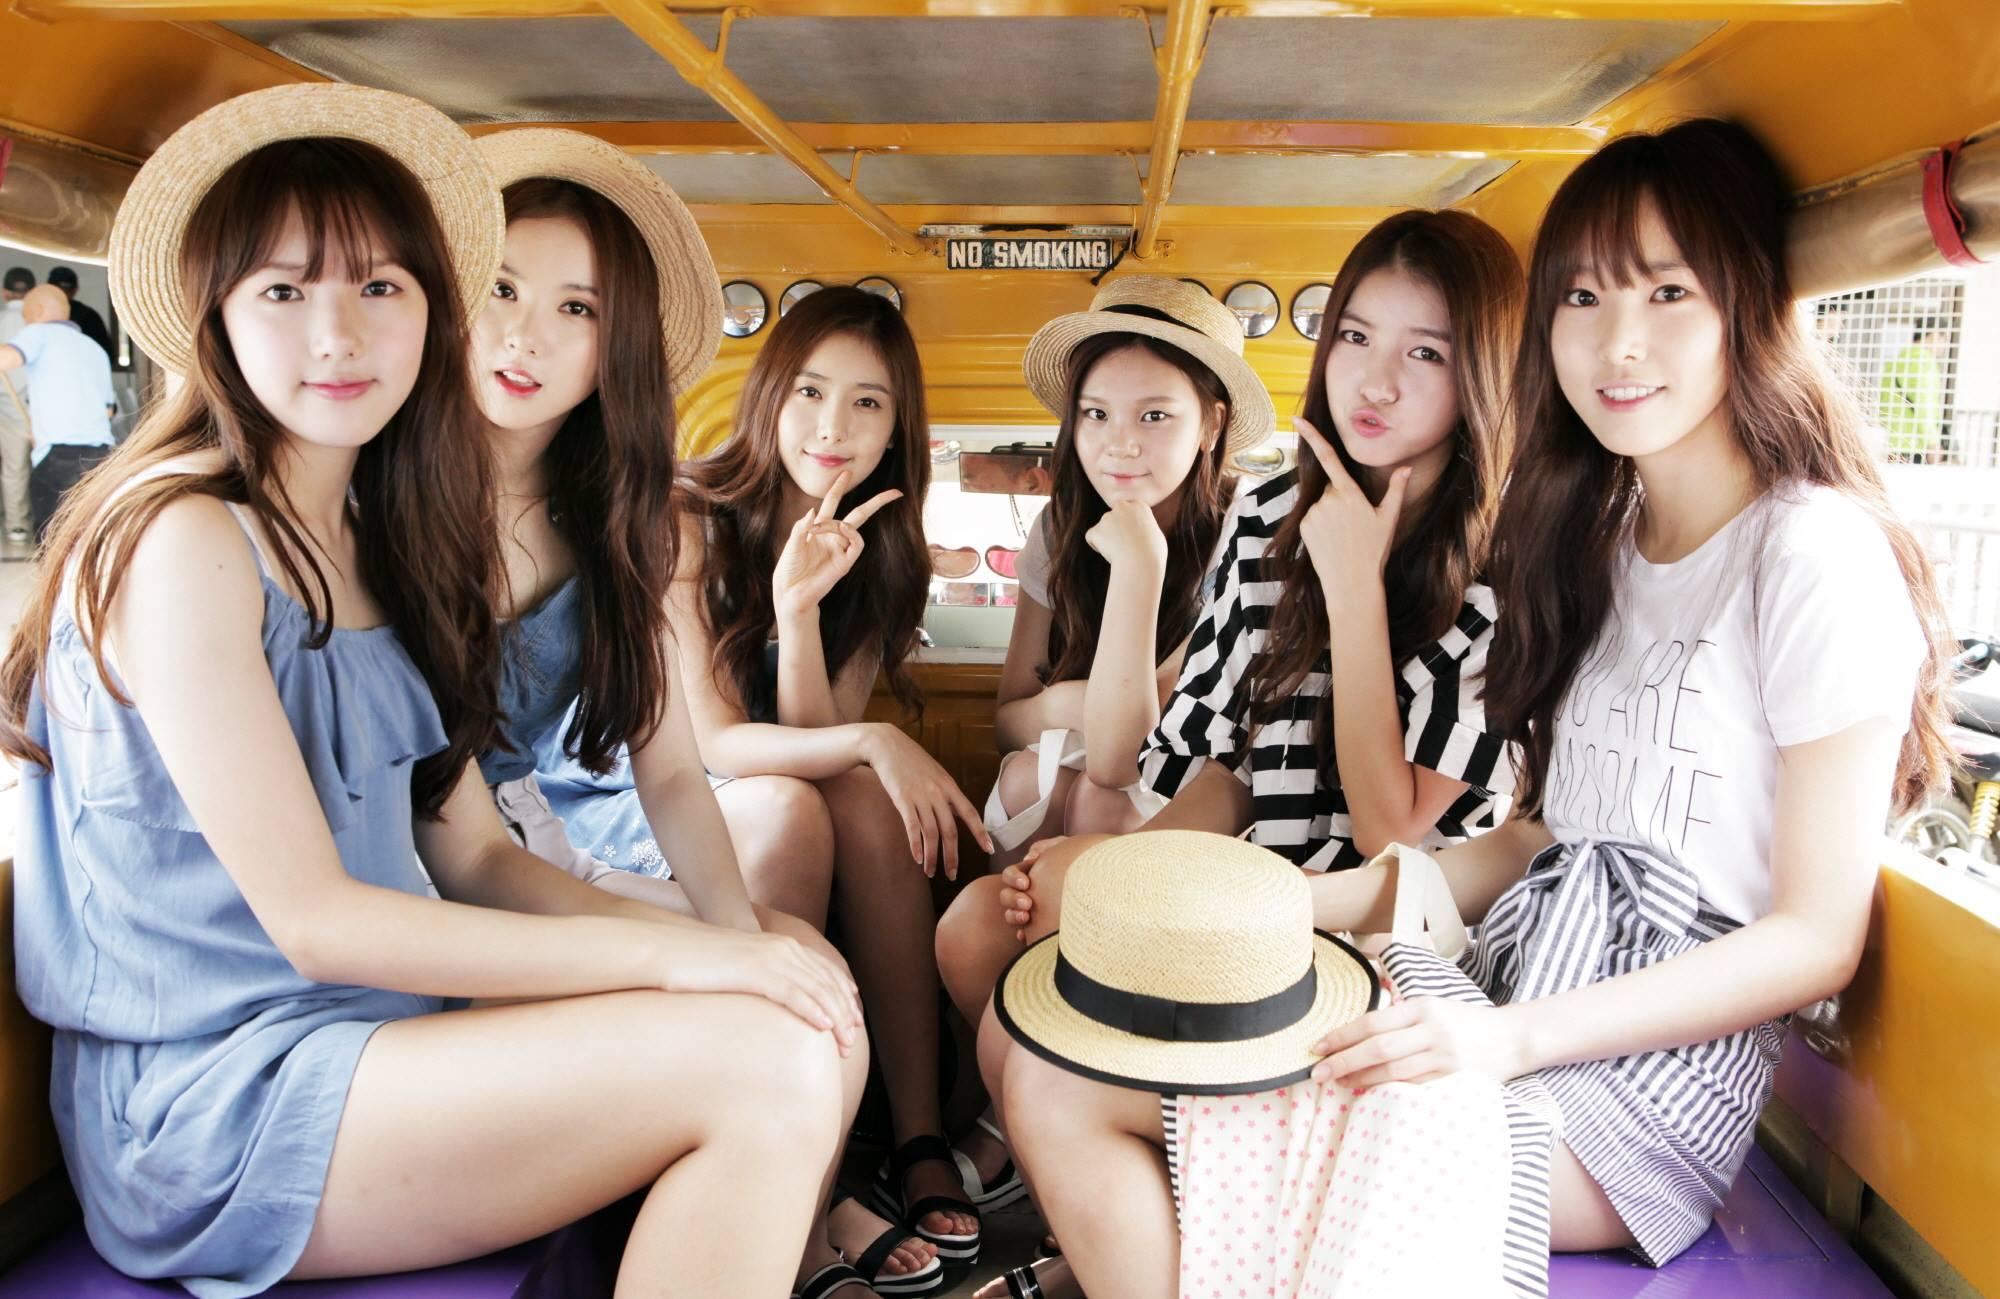 GFriend 女朋友團體今年也是人氣很旺,自從「舞台摔倒」事件後,讓大家看到她們的努力,而且也獲得了今年Melon Music Awards音樂獎的肯定!